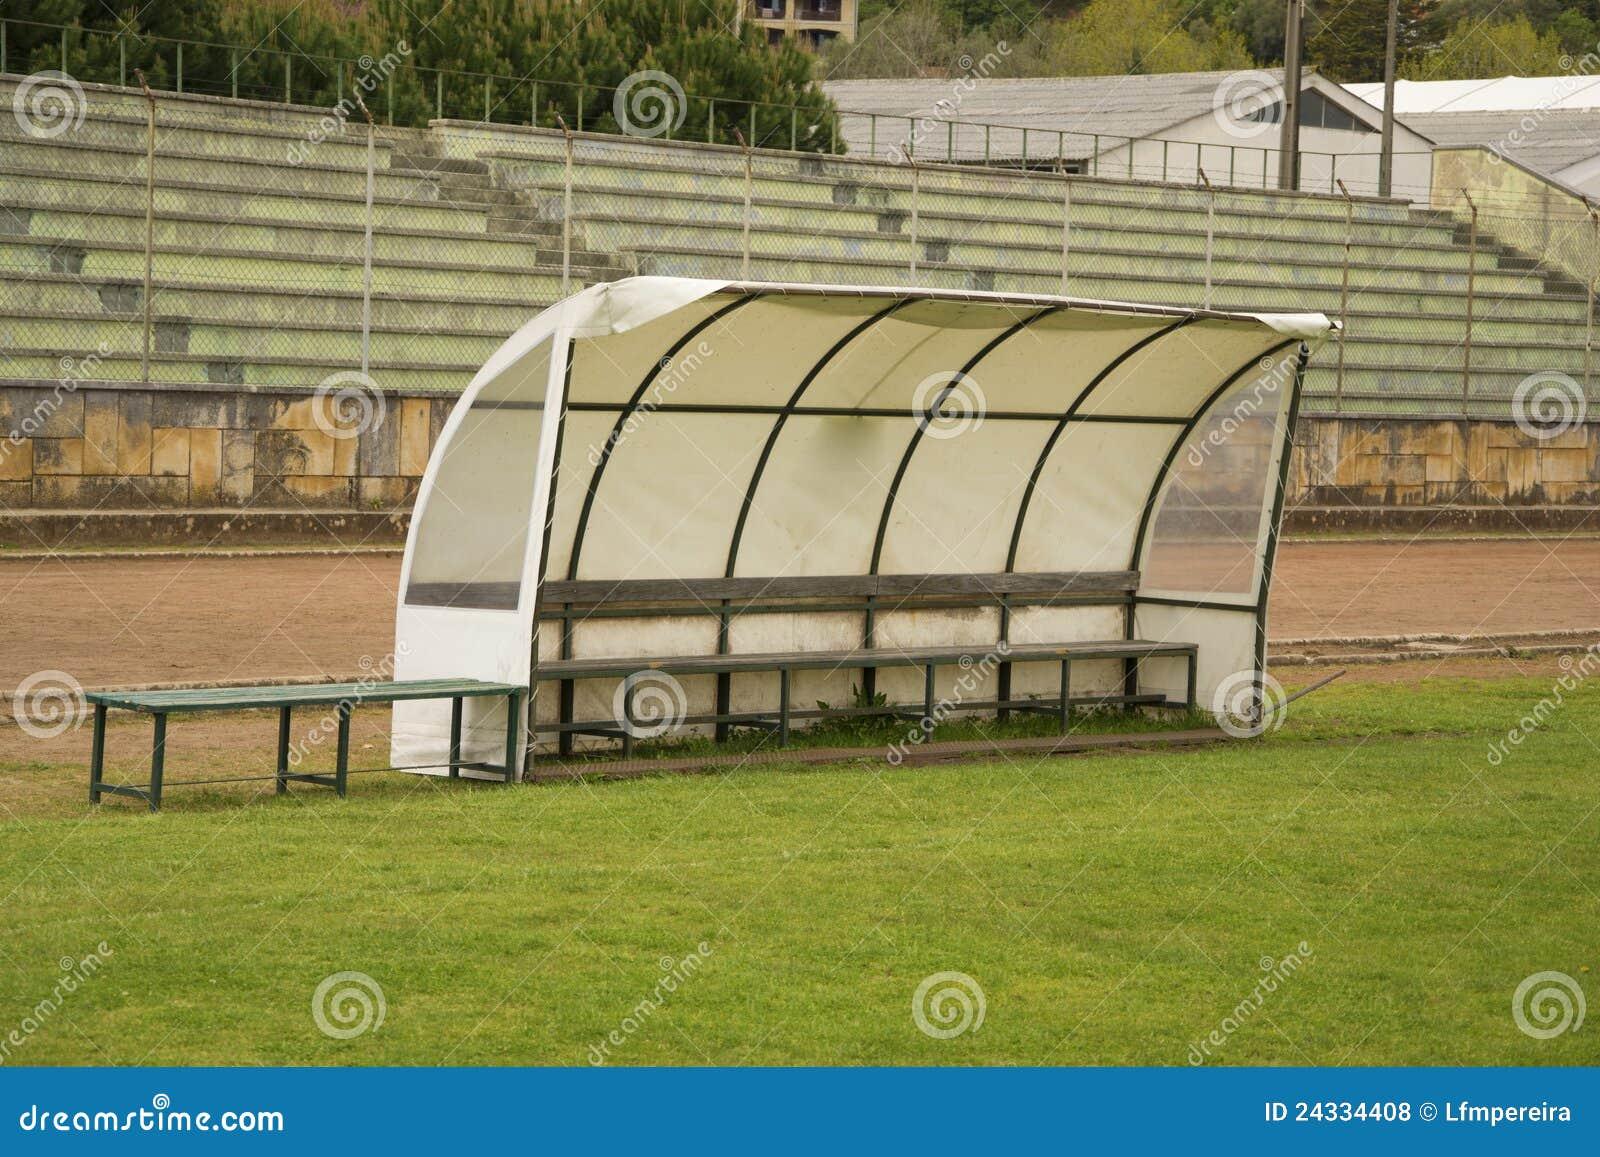 Soccer Bench Royalty Free Stock Photos Image 24334408